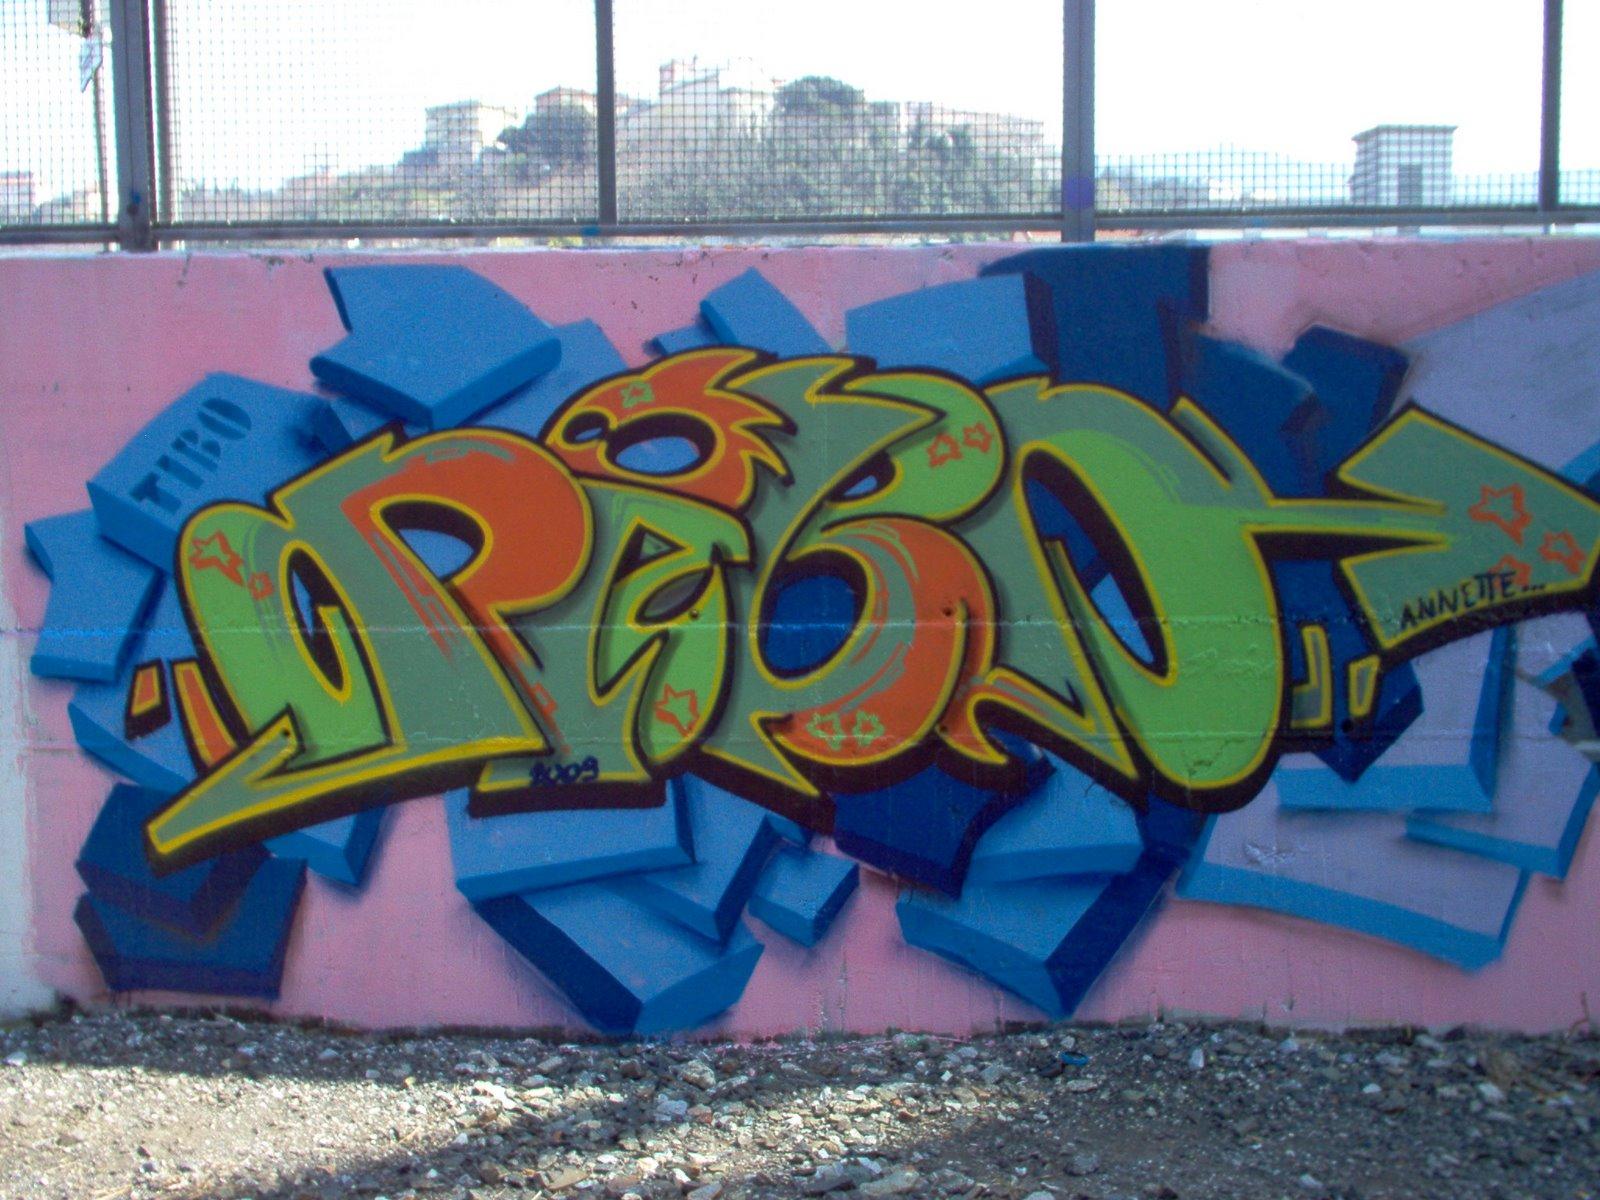 GraffitiGen - Graffiti Creator - Make Custom Graffiti - HD Wallpapers